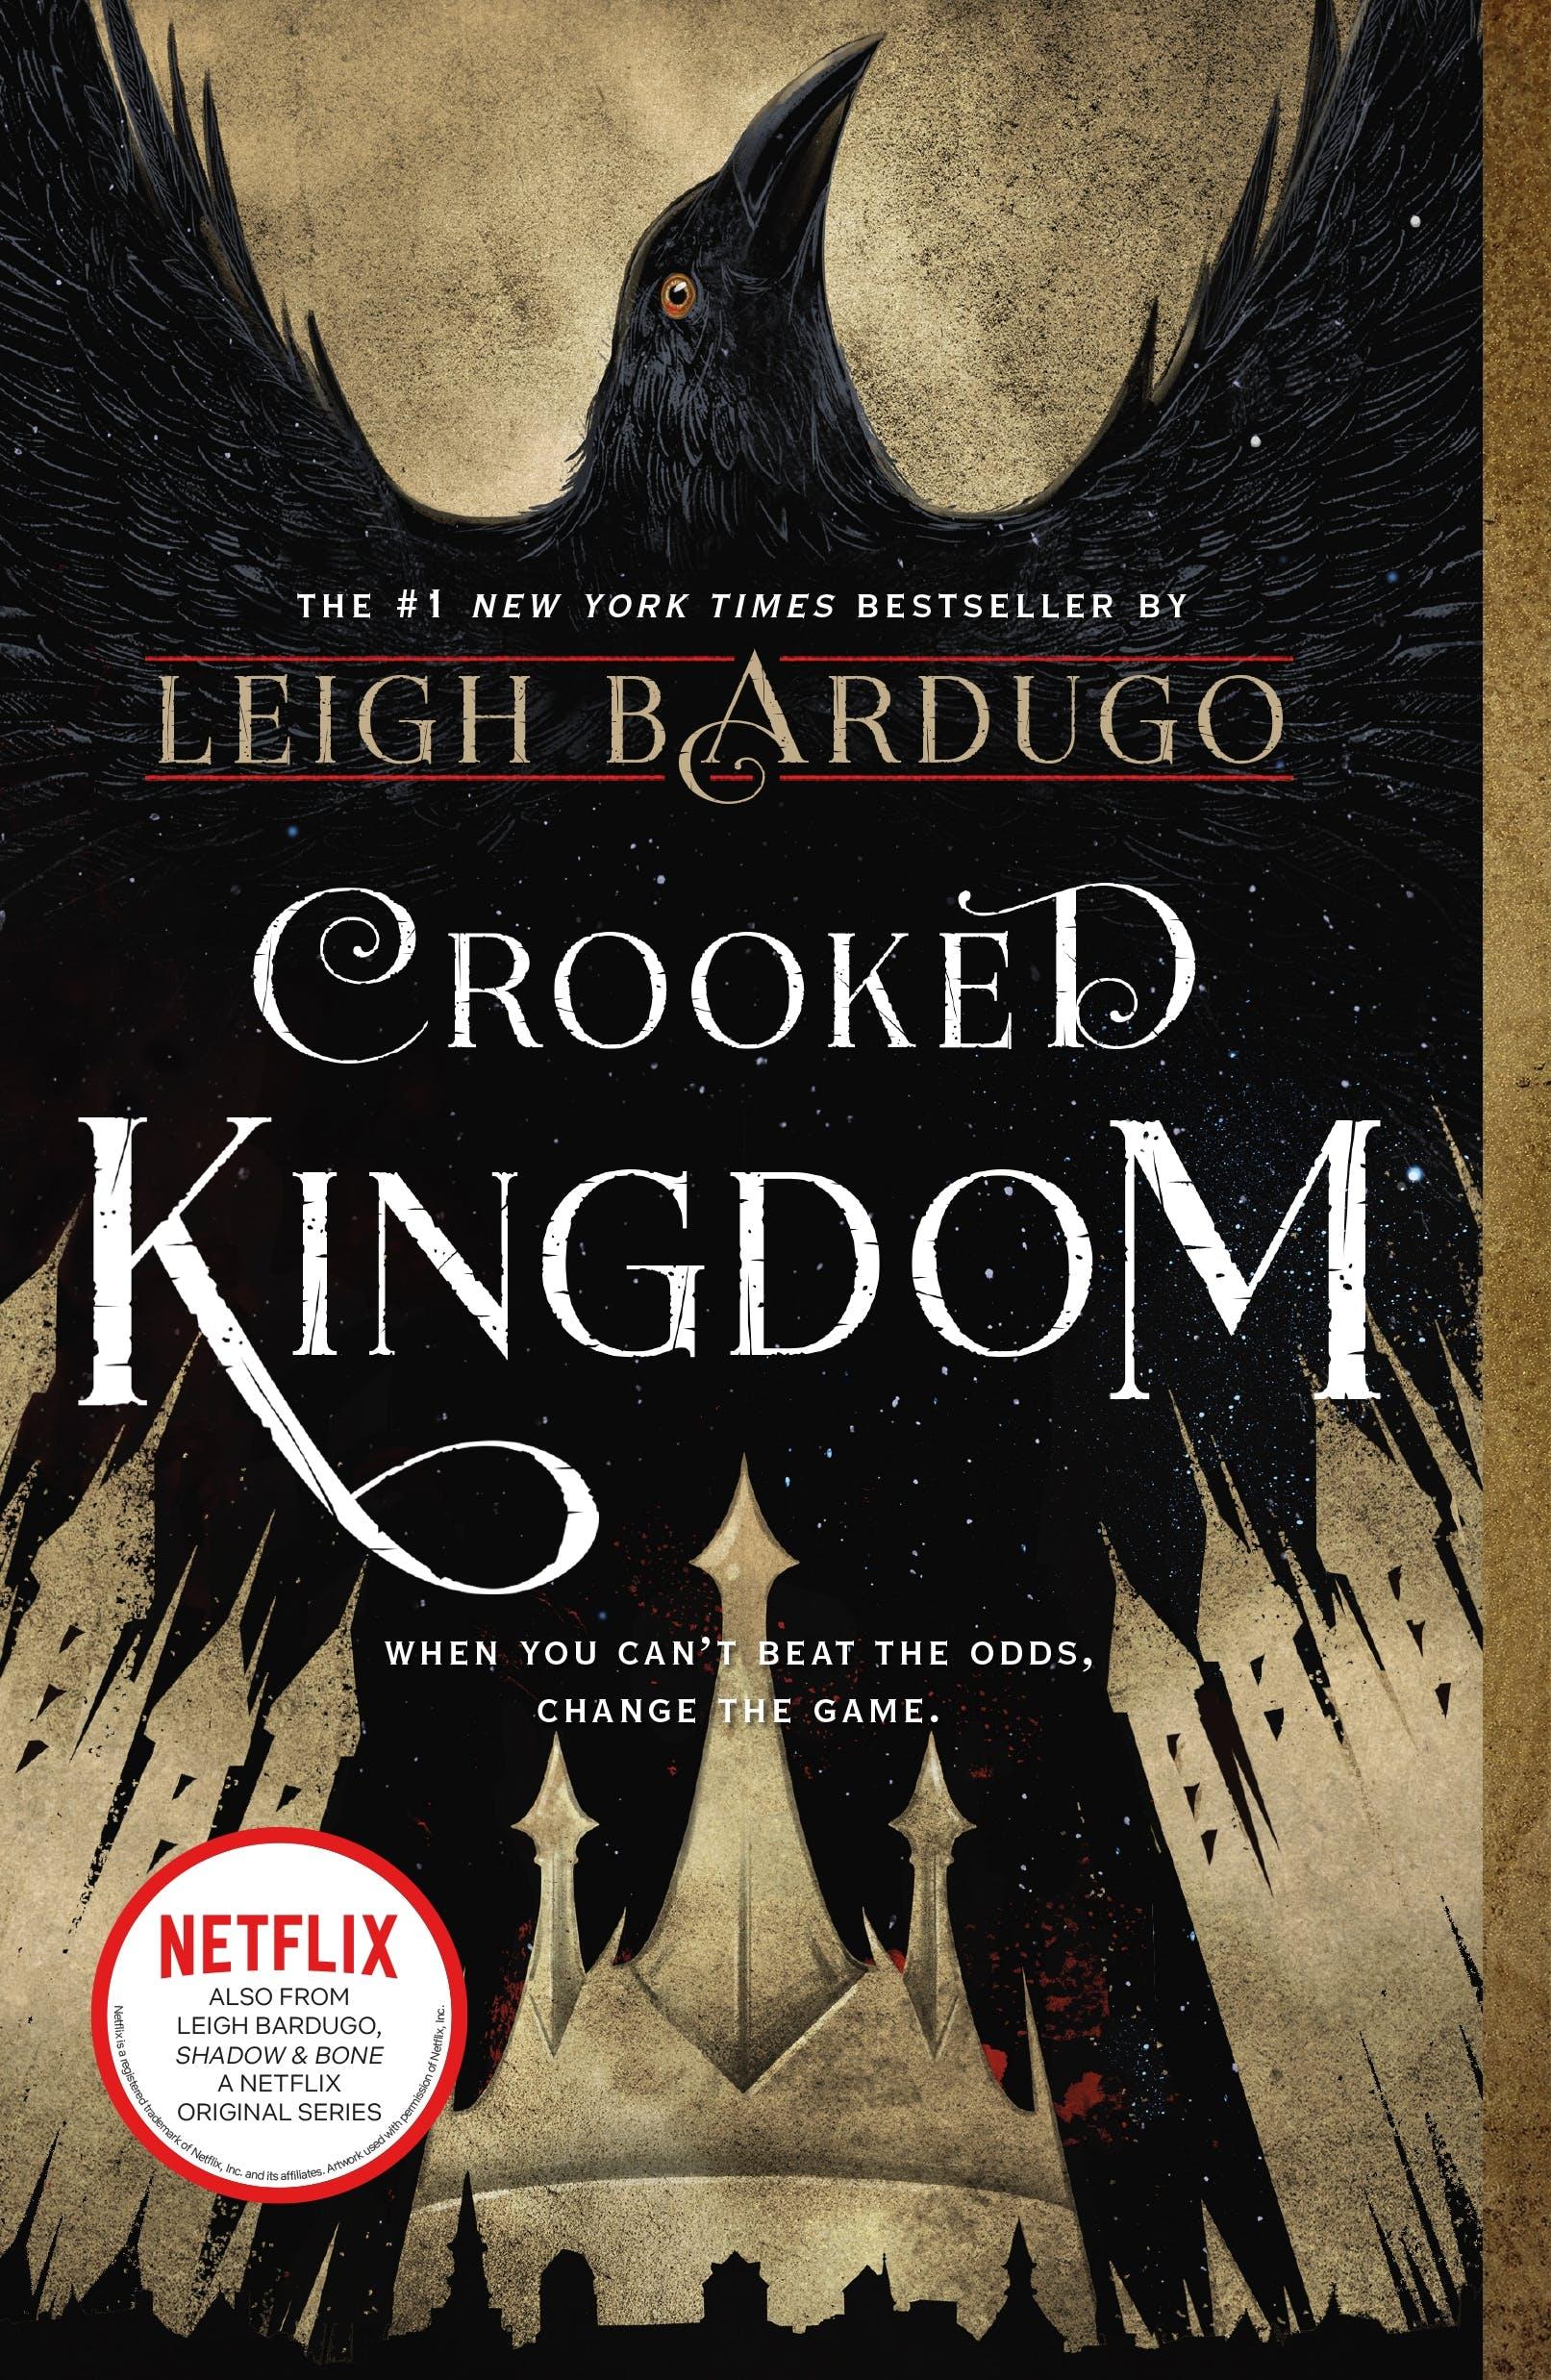 Image of Crooked Kingdom